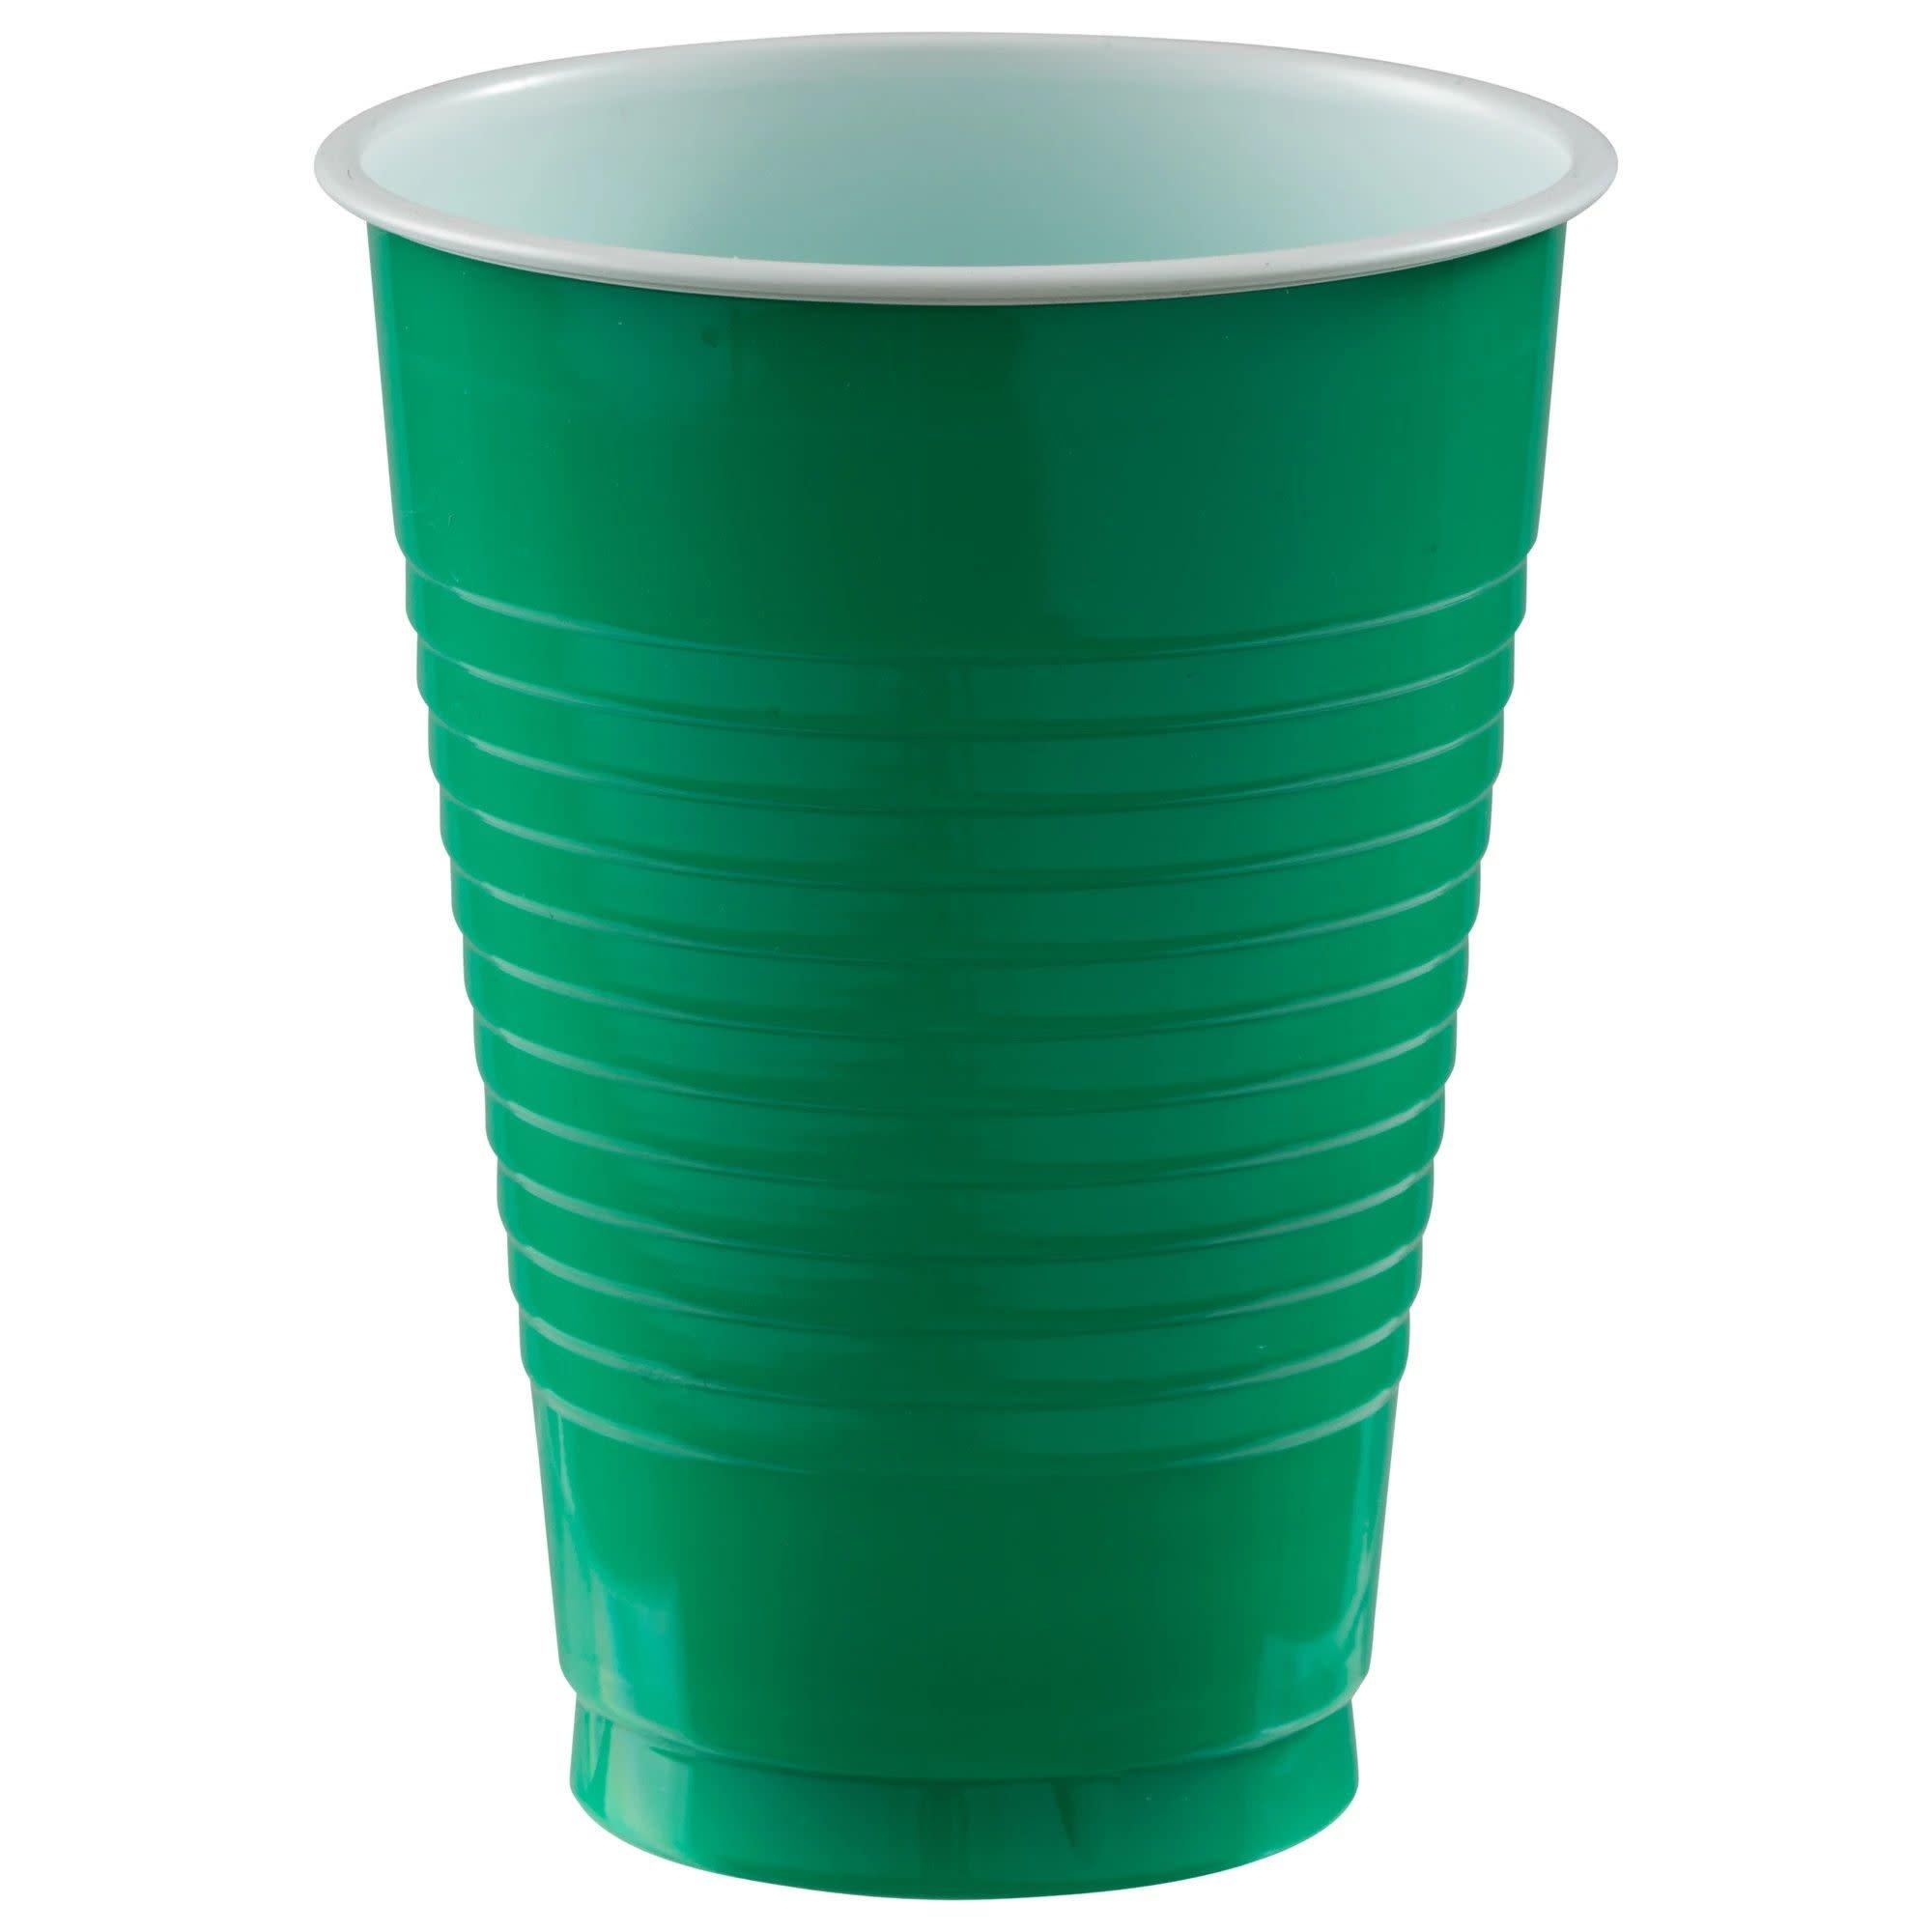 12 Oz. Plastic Cups, Mid Ct. - Festive Green